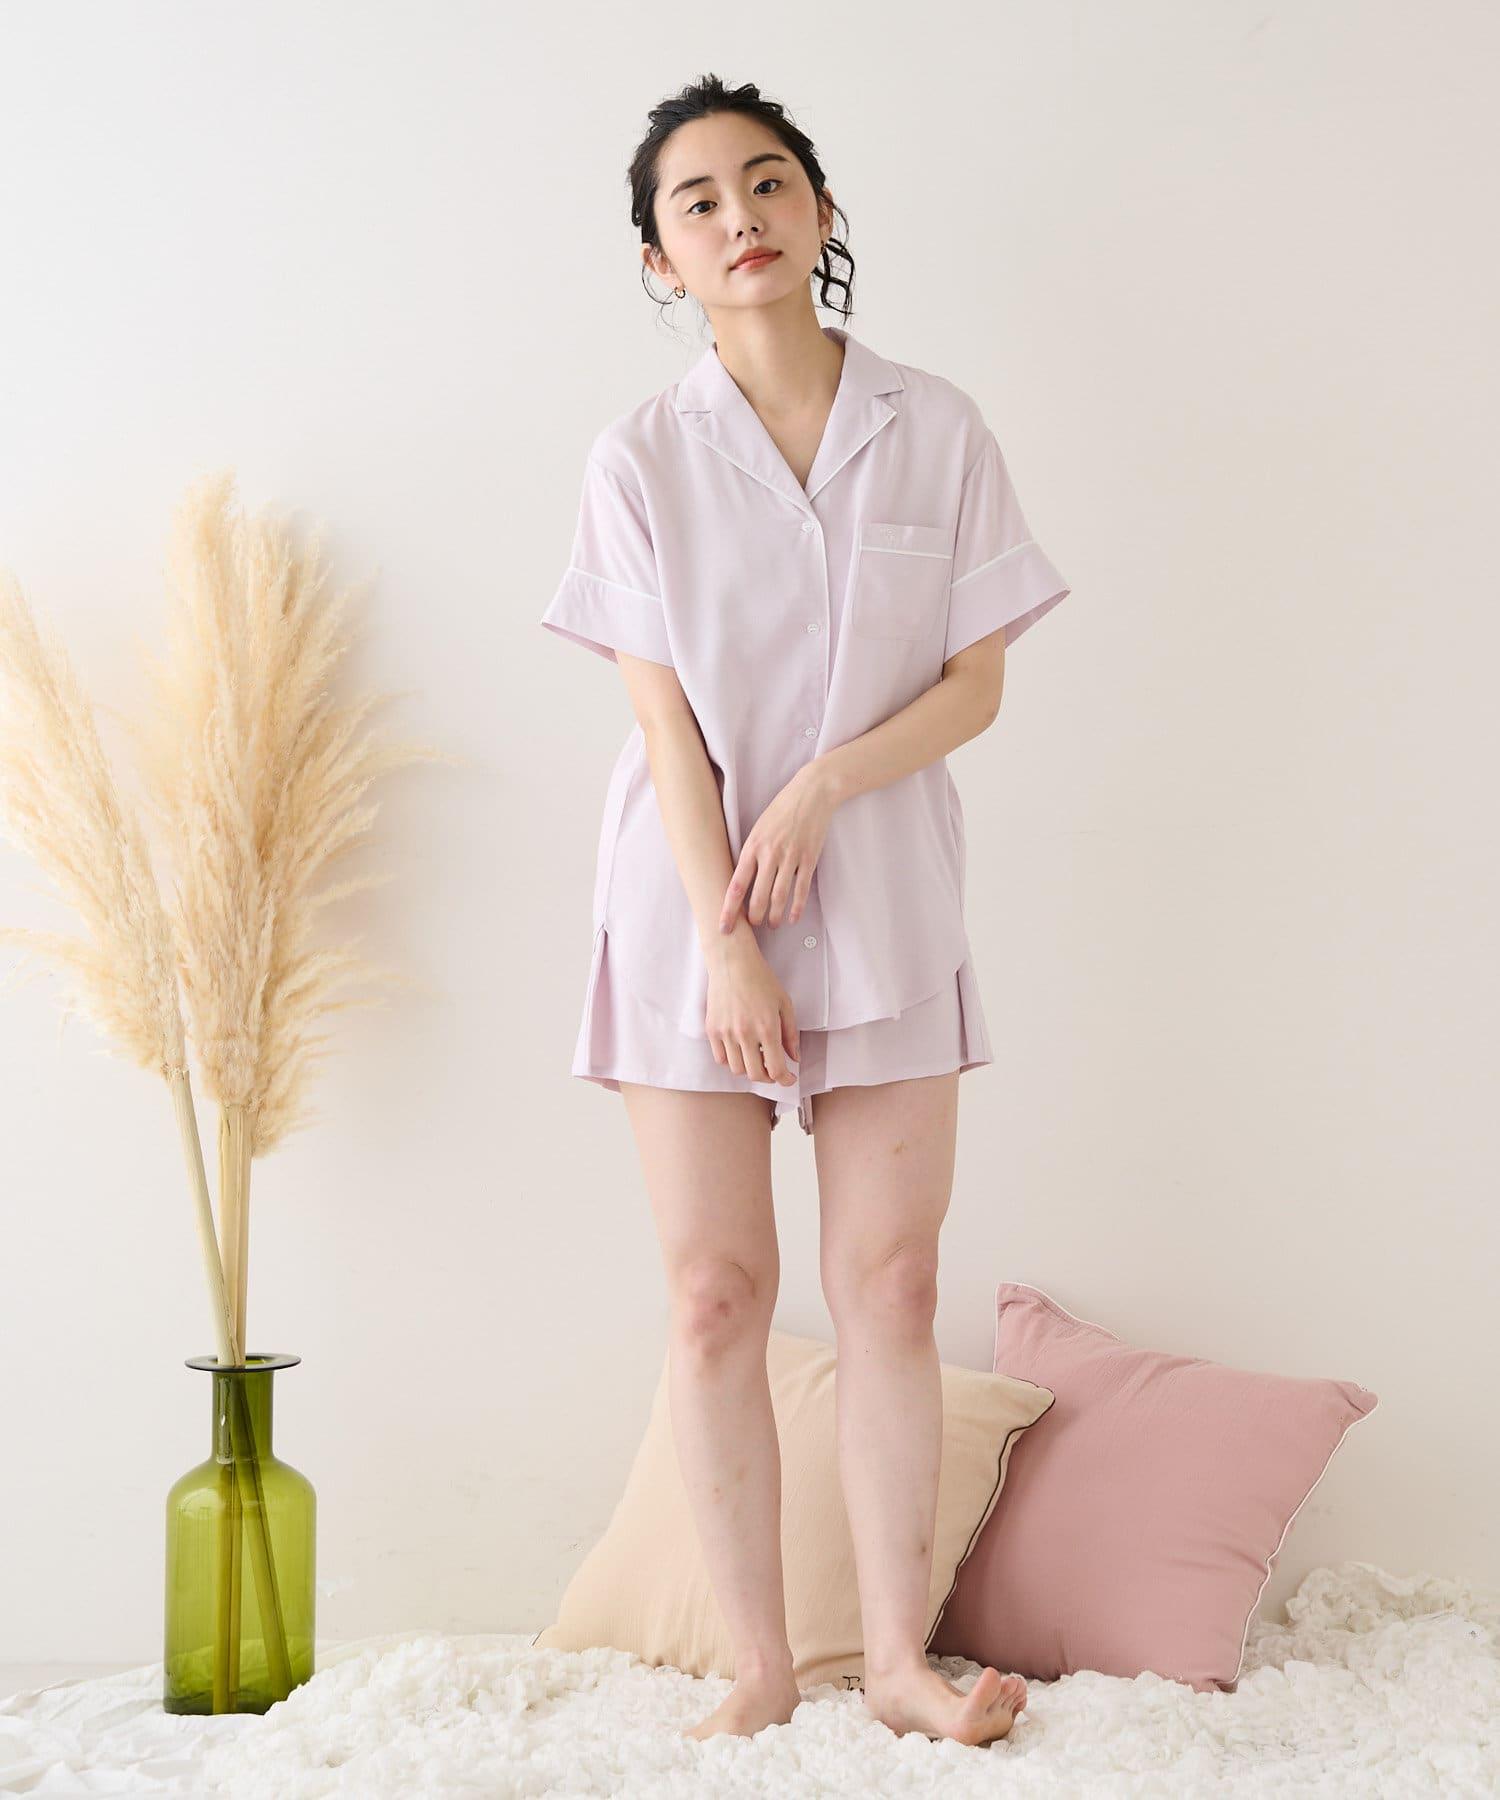 TERRITOIRE(テリトワール) 【しあわせな眠りを】LADIES快眠リラックスパジャマ 半/半セット